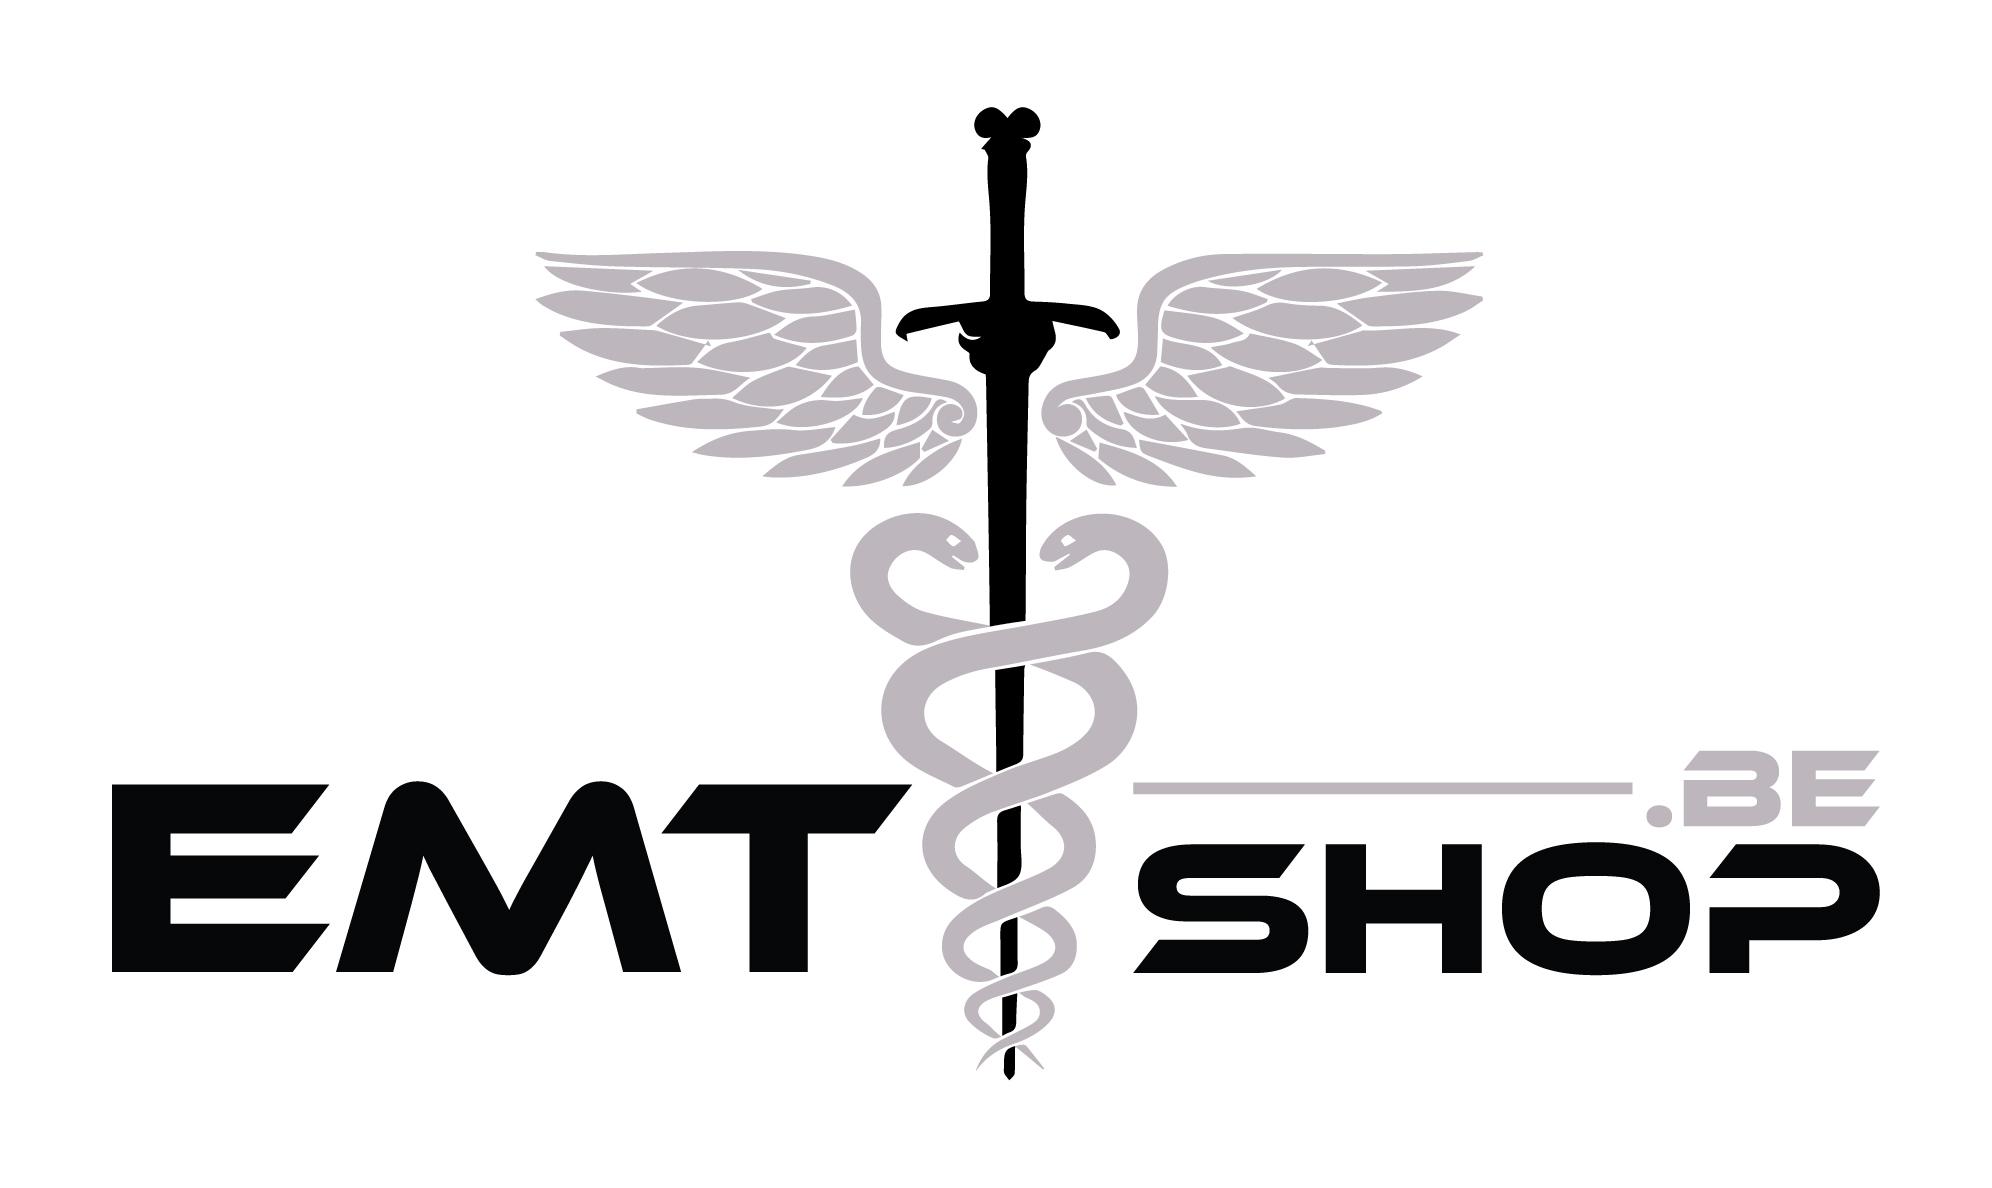 www.EMTshop.be - www.emtshop.be abc390fcce